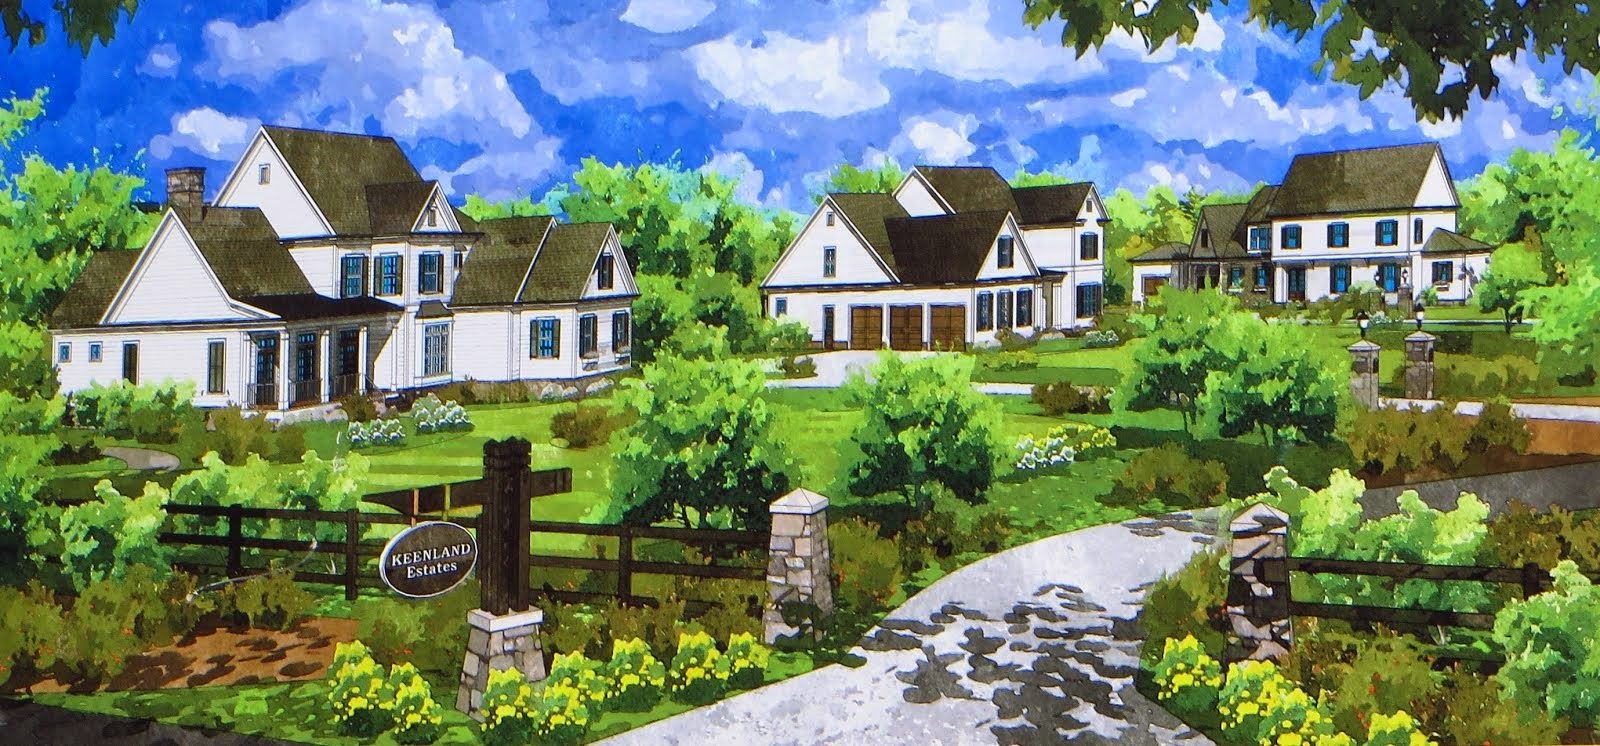 Keeneland Estates